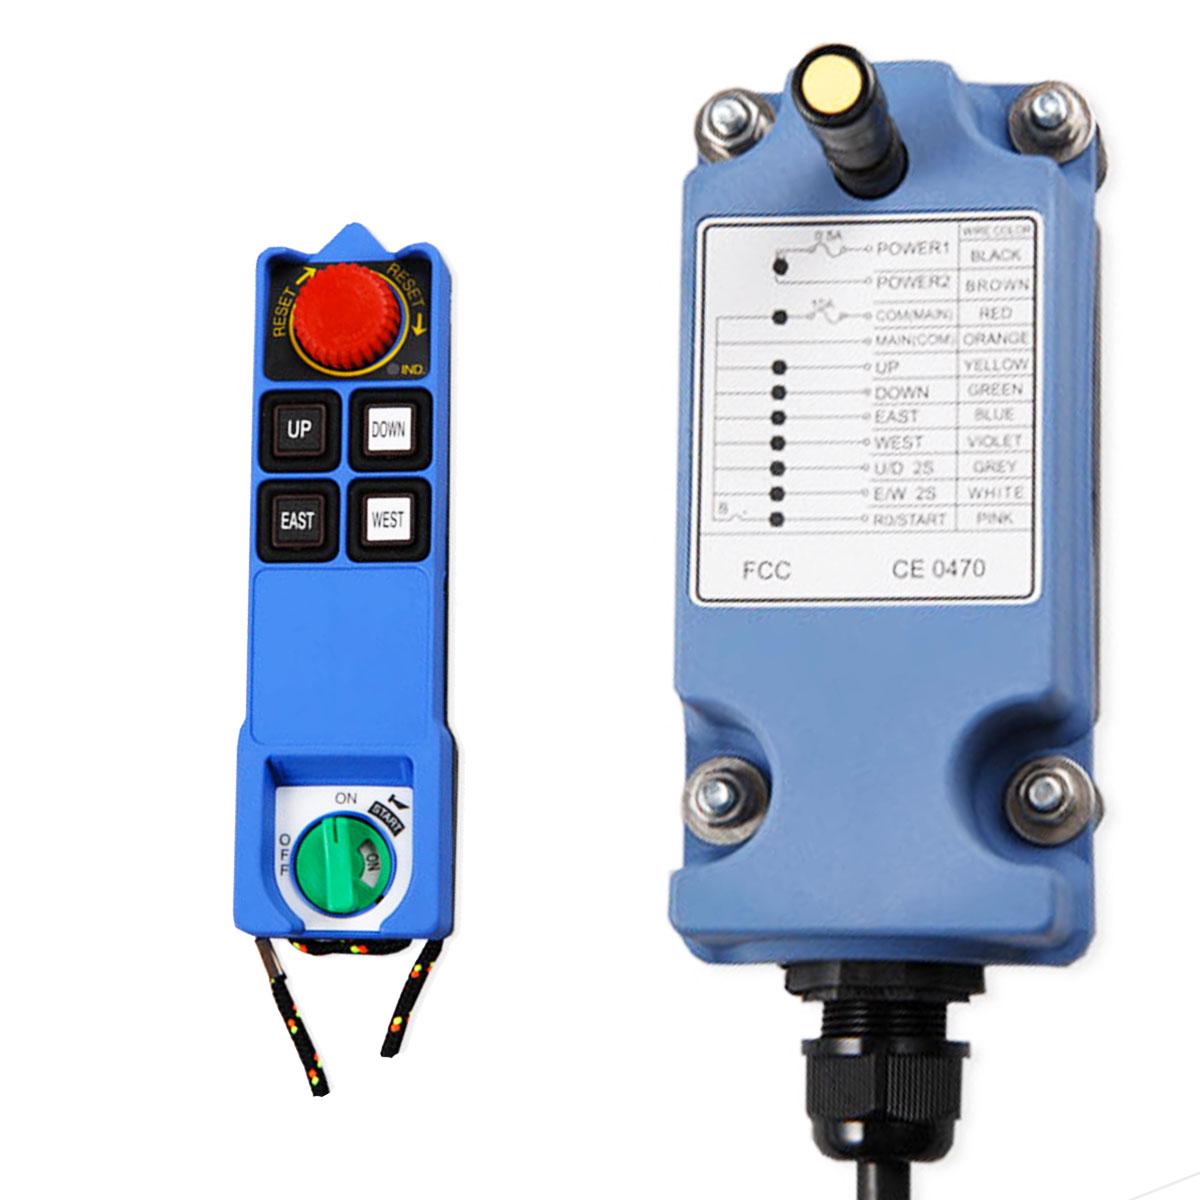 Radiocommande et récepteur Falard L6Bet L8B